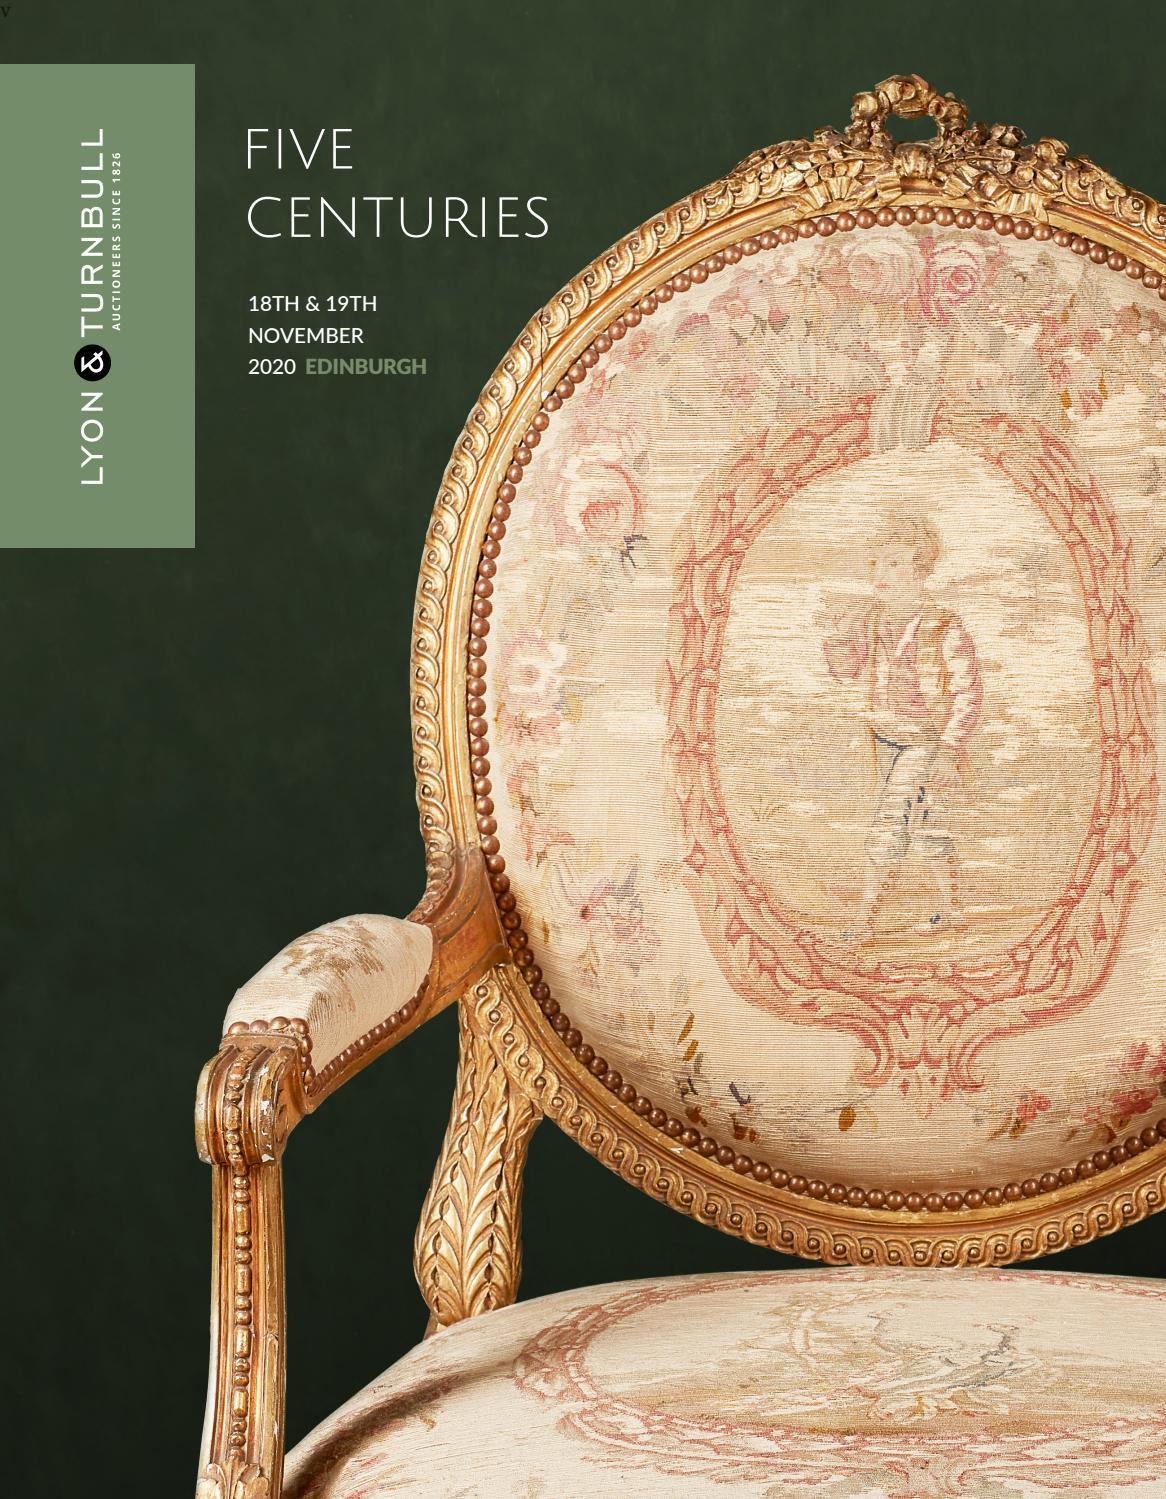 Five Centuries